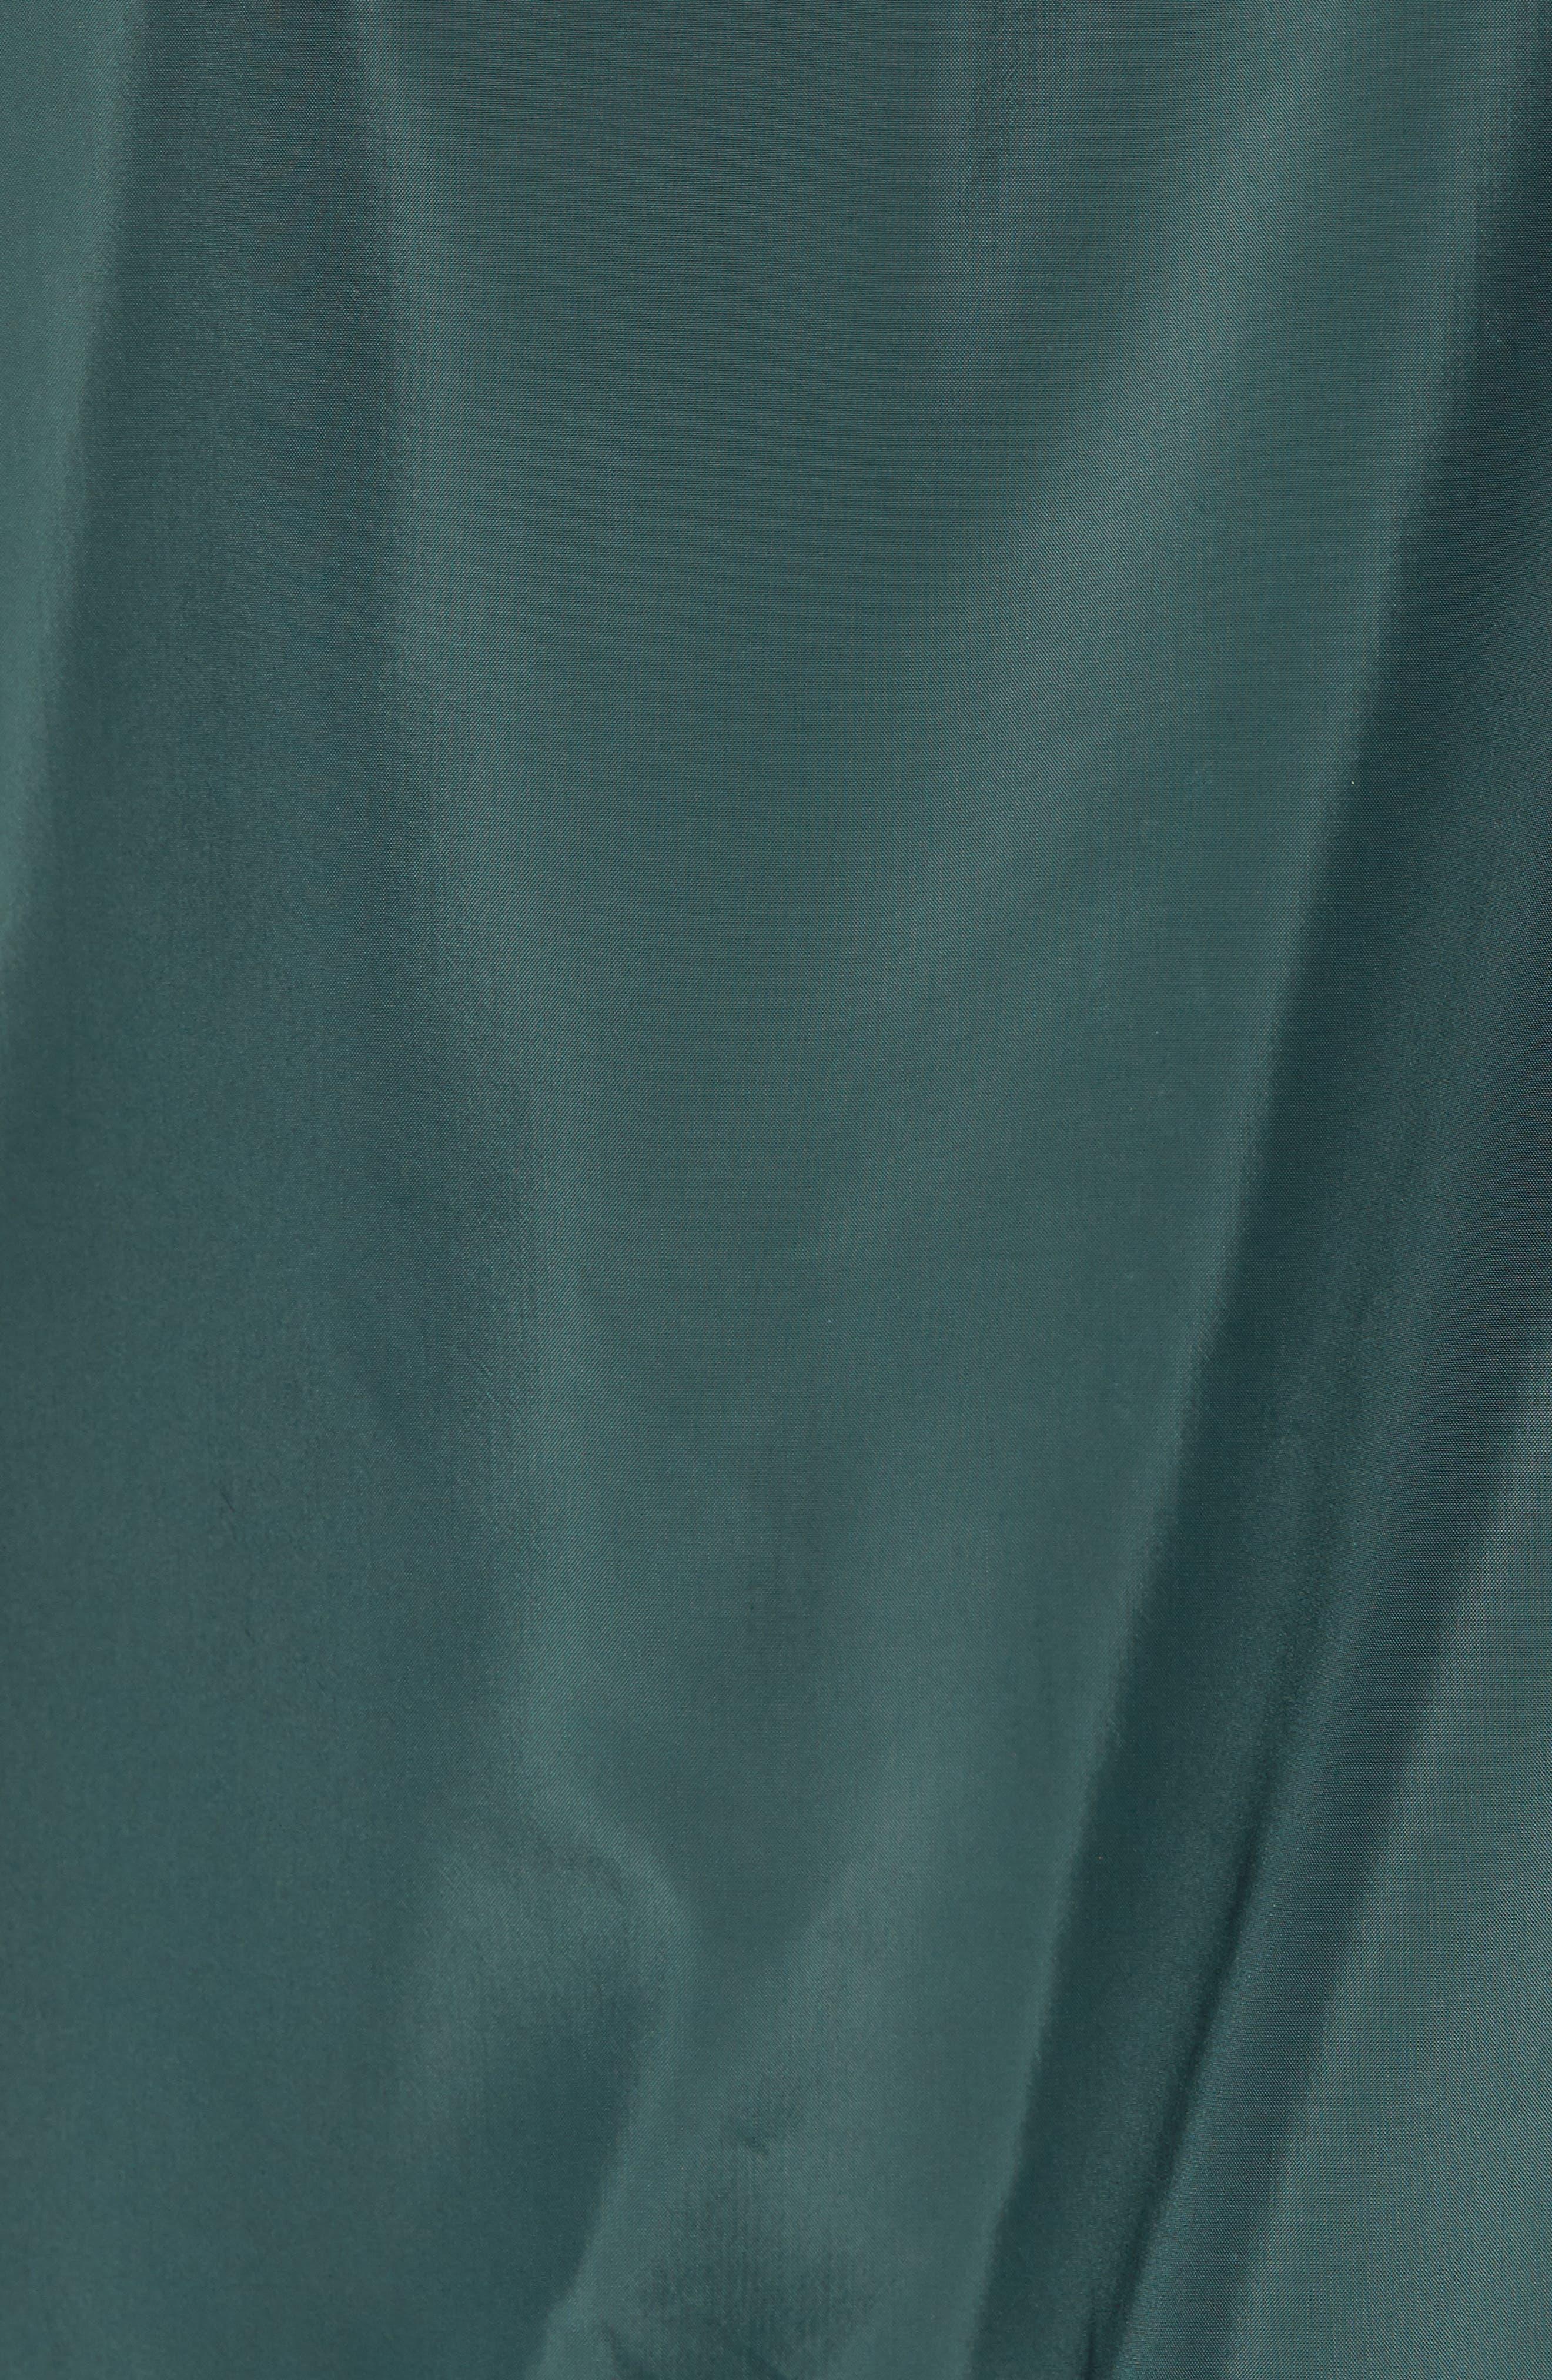 Colorblock Hooded Windbreaker Jacket,                             Alternate thumbnail 7, color,                             BLACK GREEN ODINITE